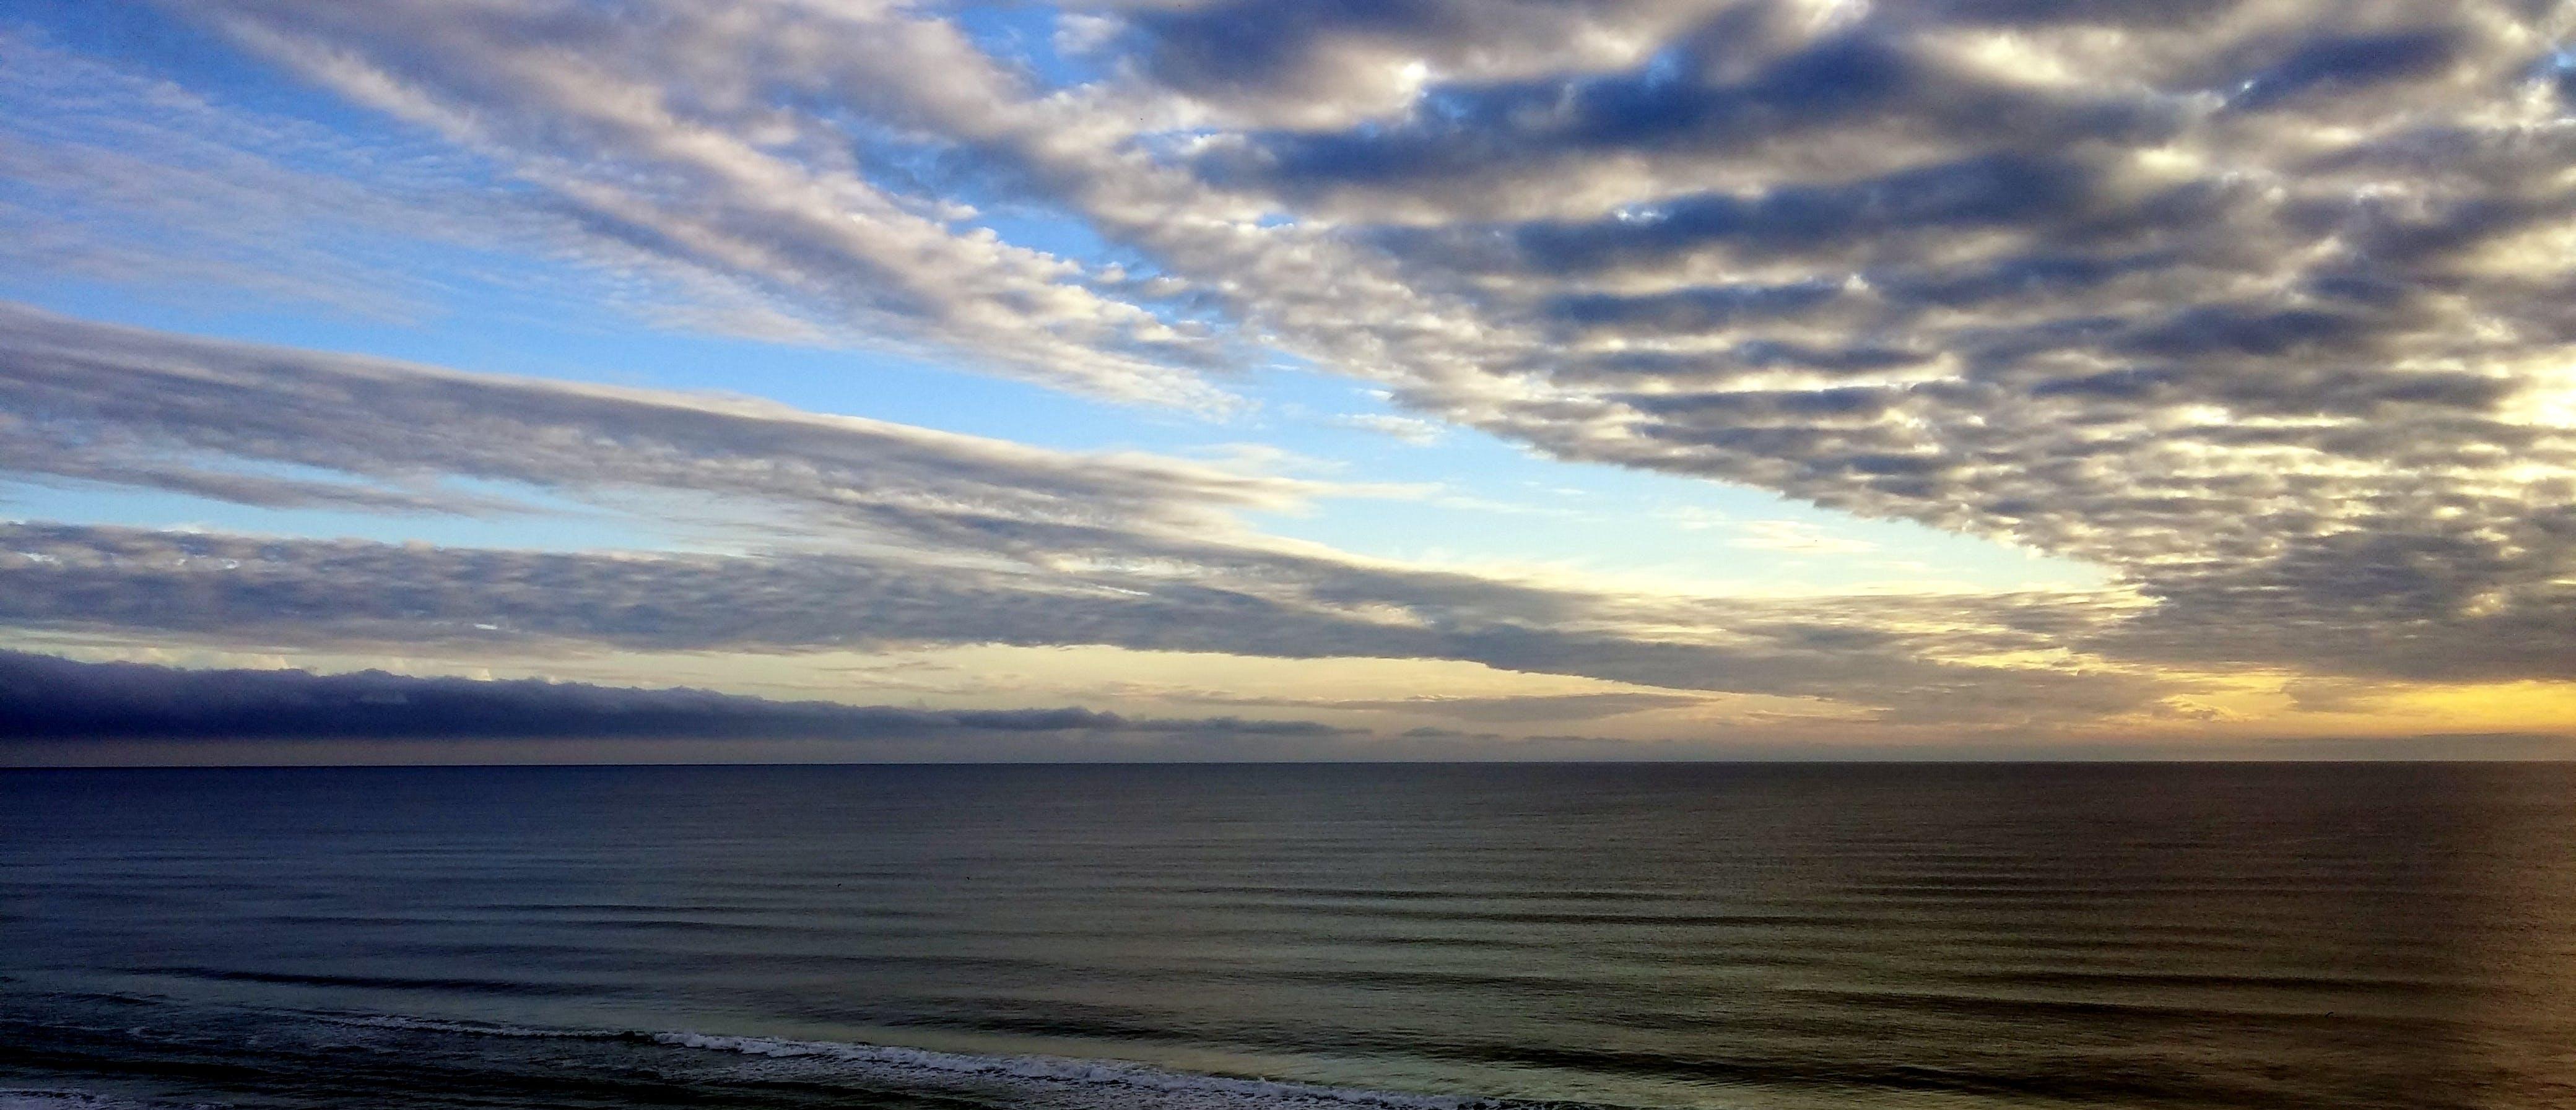 White Sky Under Blue Sea during Dawn